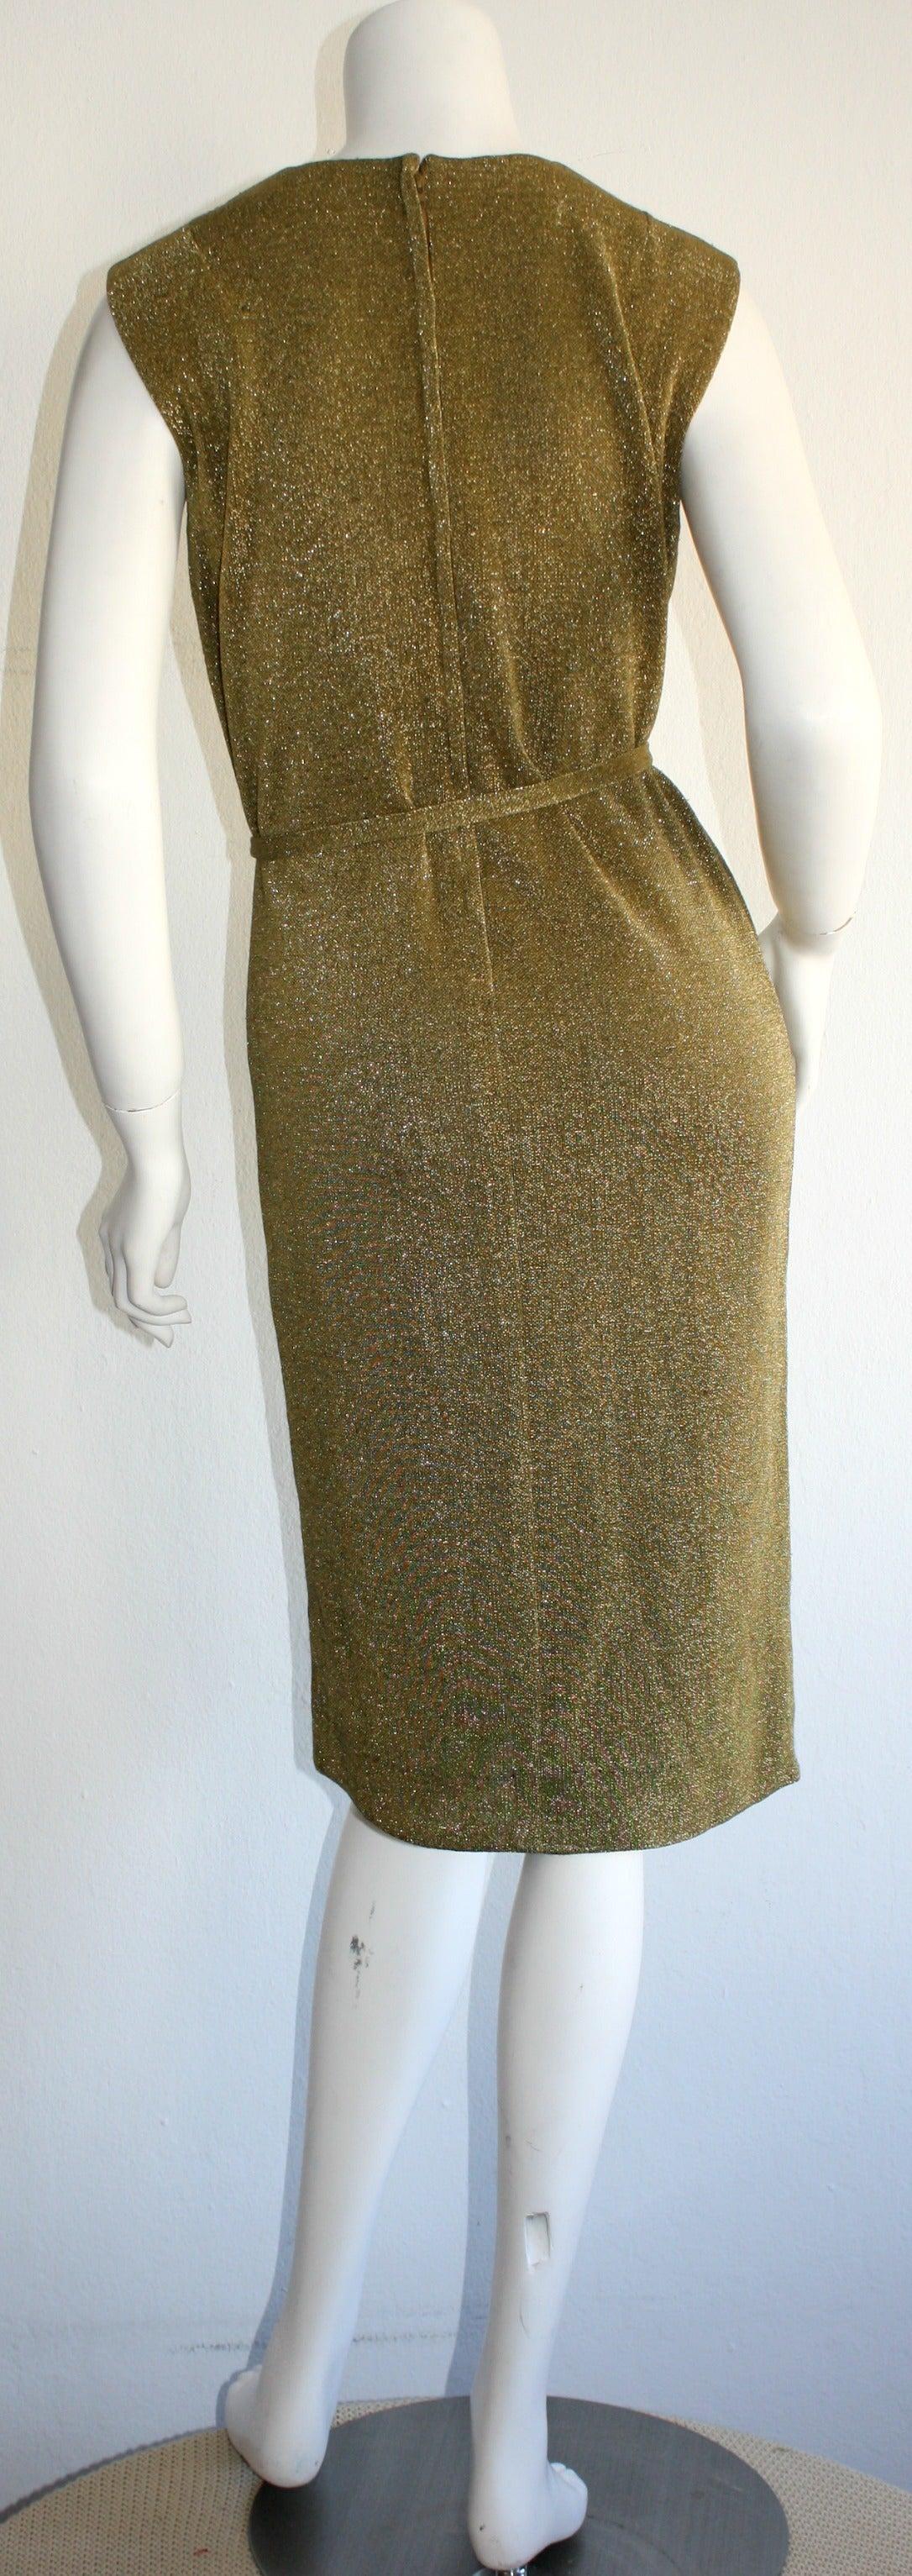 Rudi Gernreich For Harmon Knits 1960s Gold Metallic Dress 3